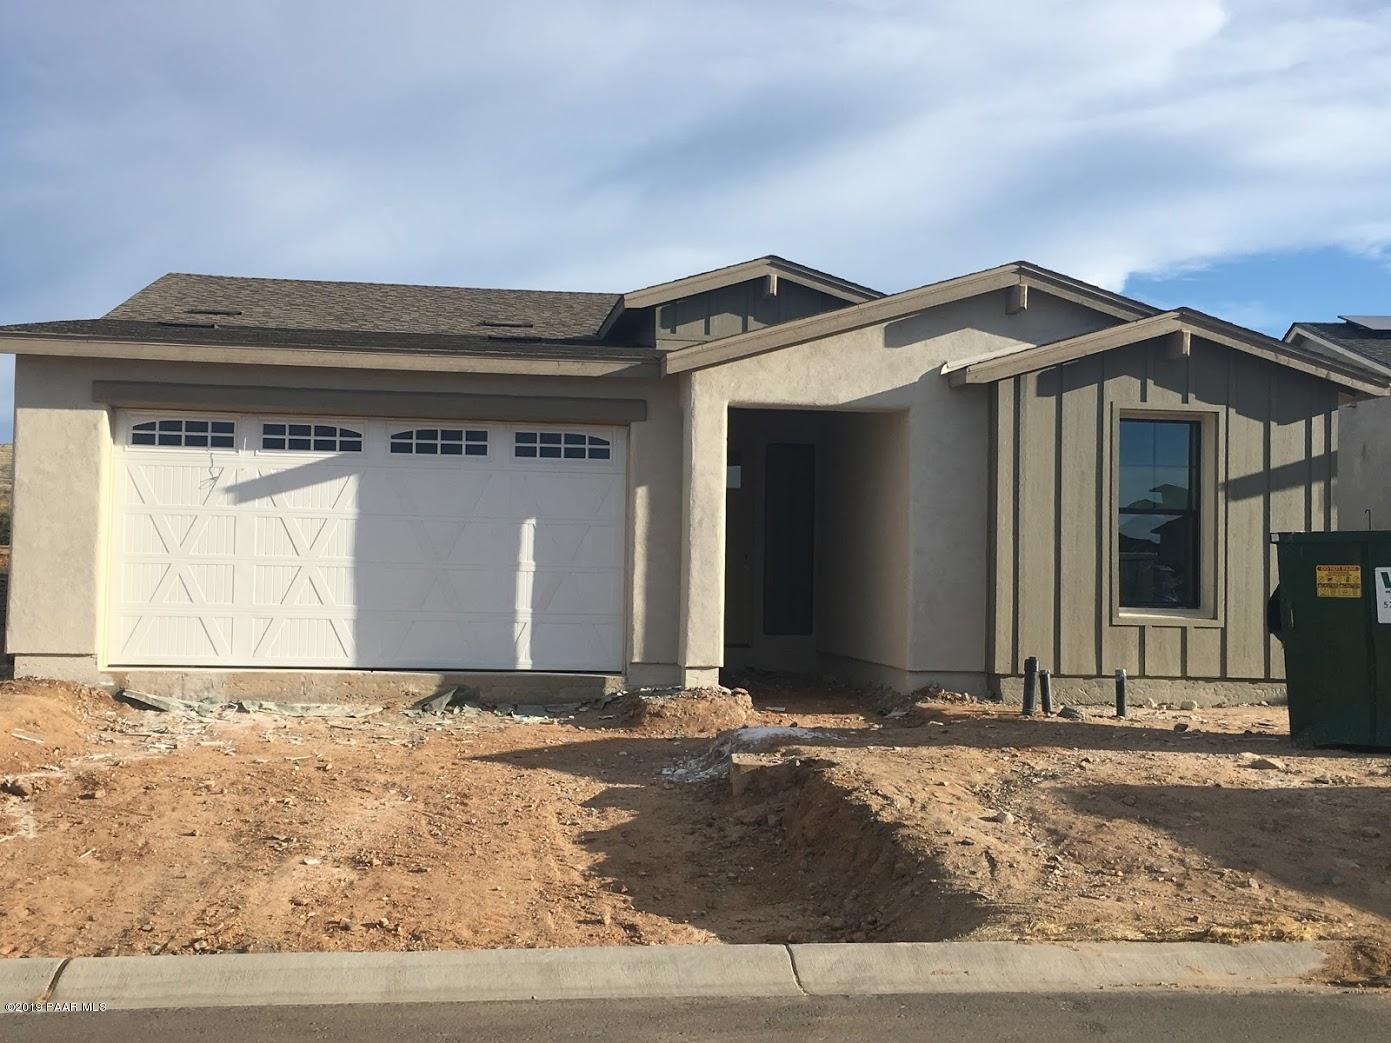 Photo of 5294 Tranquil Bluff, Prescott, AZ 86301